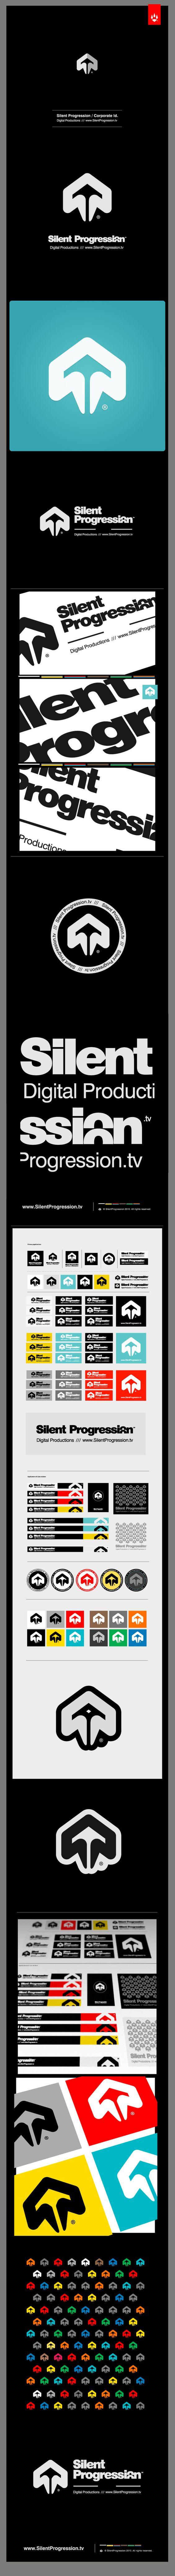 Silent Progression by KRFX , via Behance